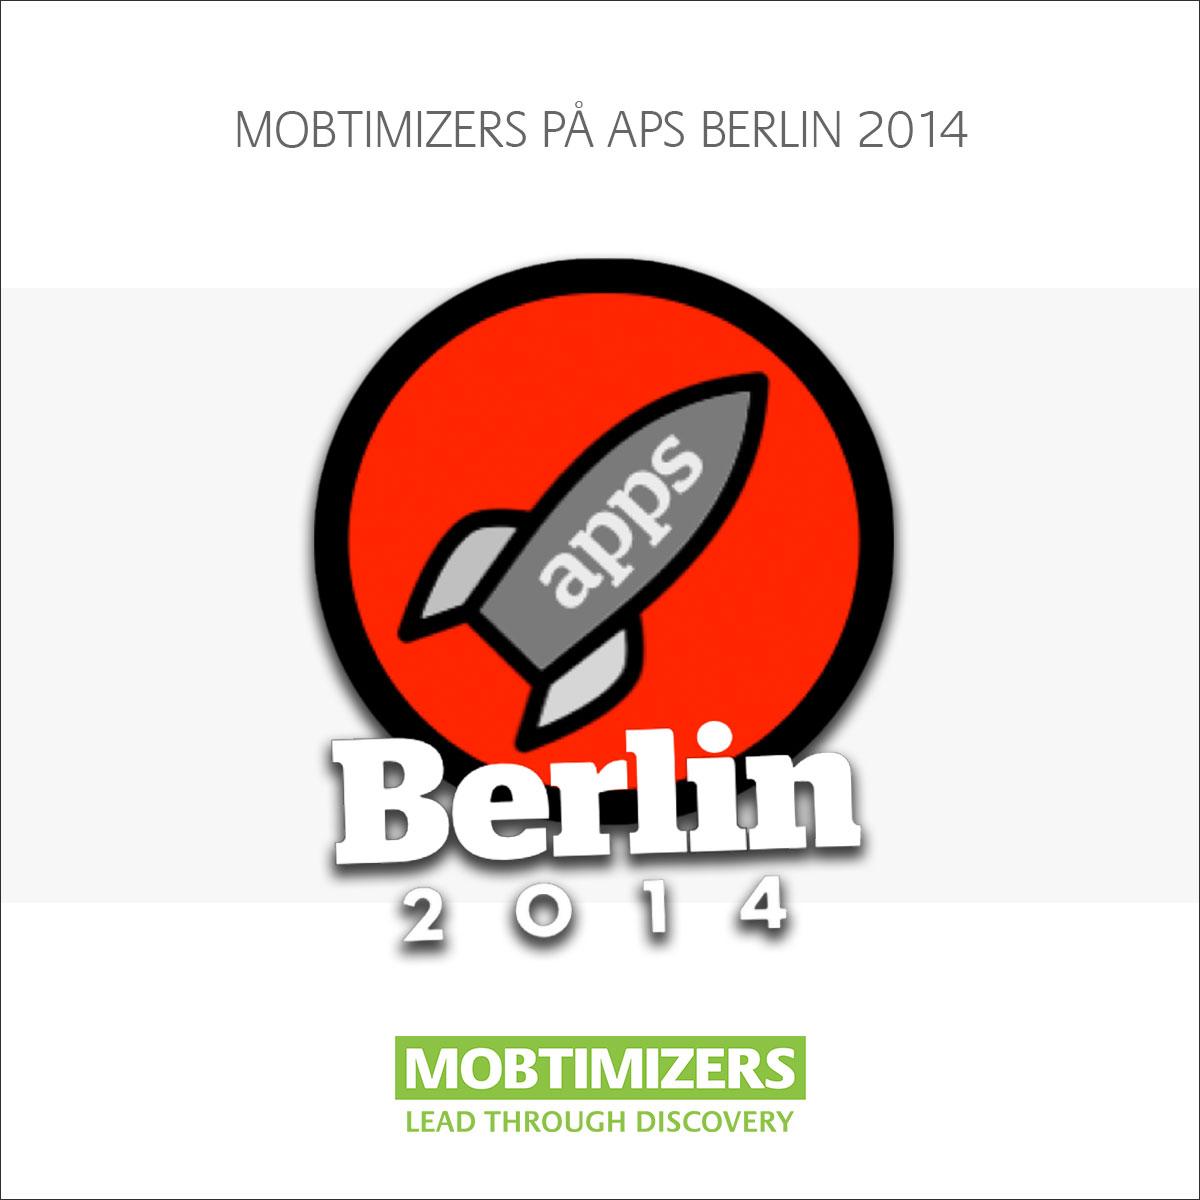 App Markedsføring paa APS Berlin 2014